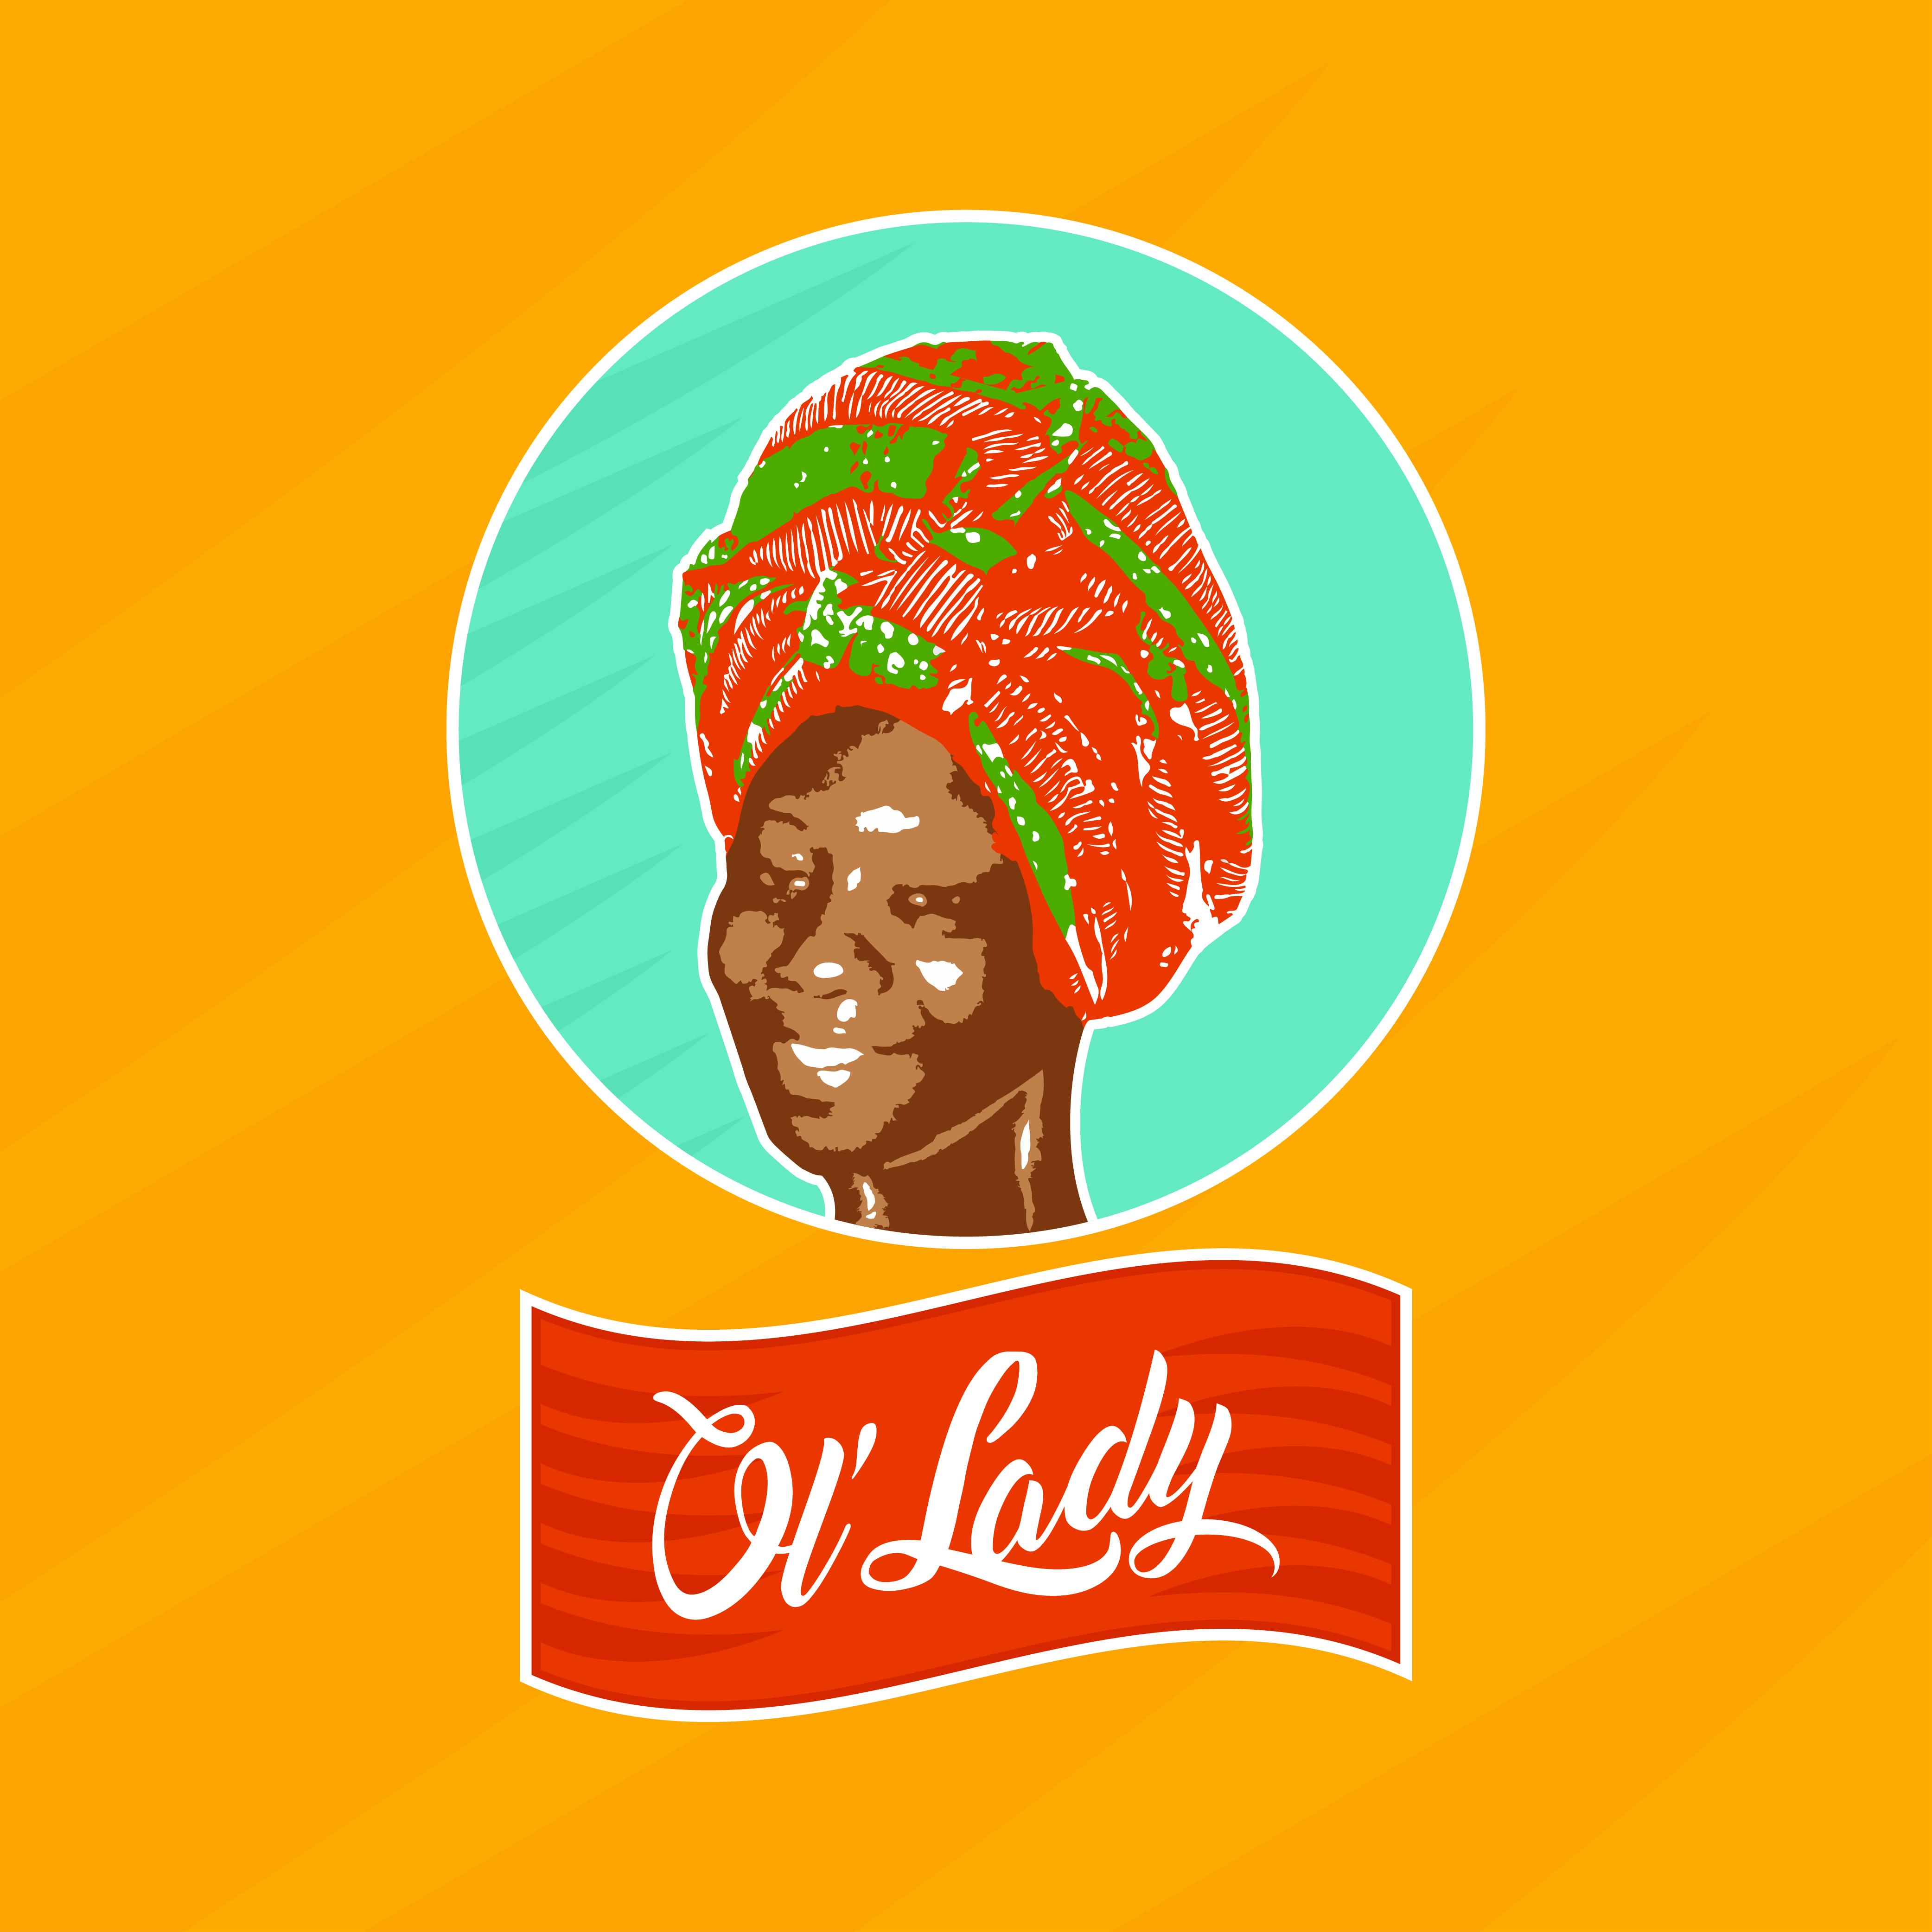 ol' lady